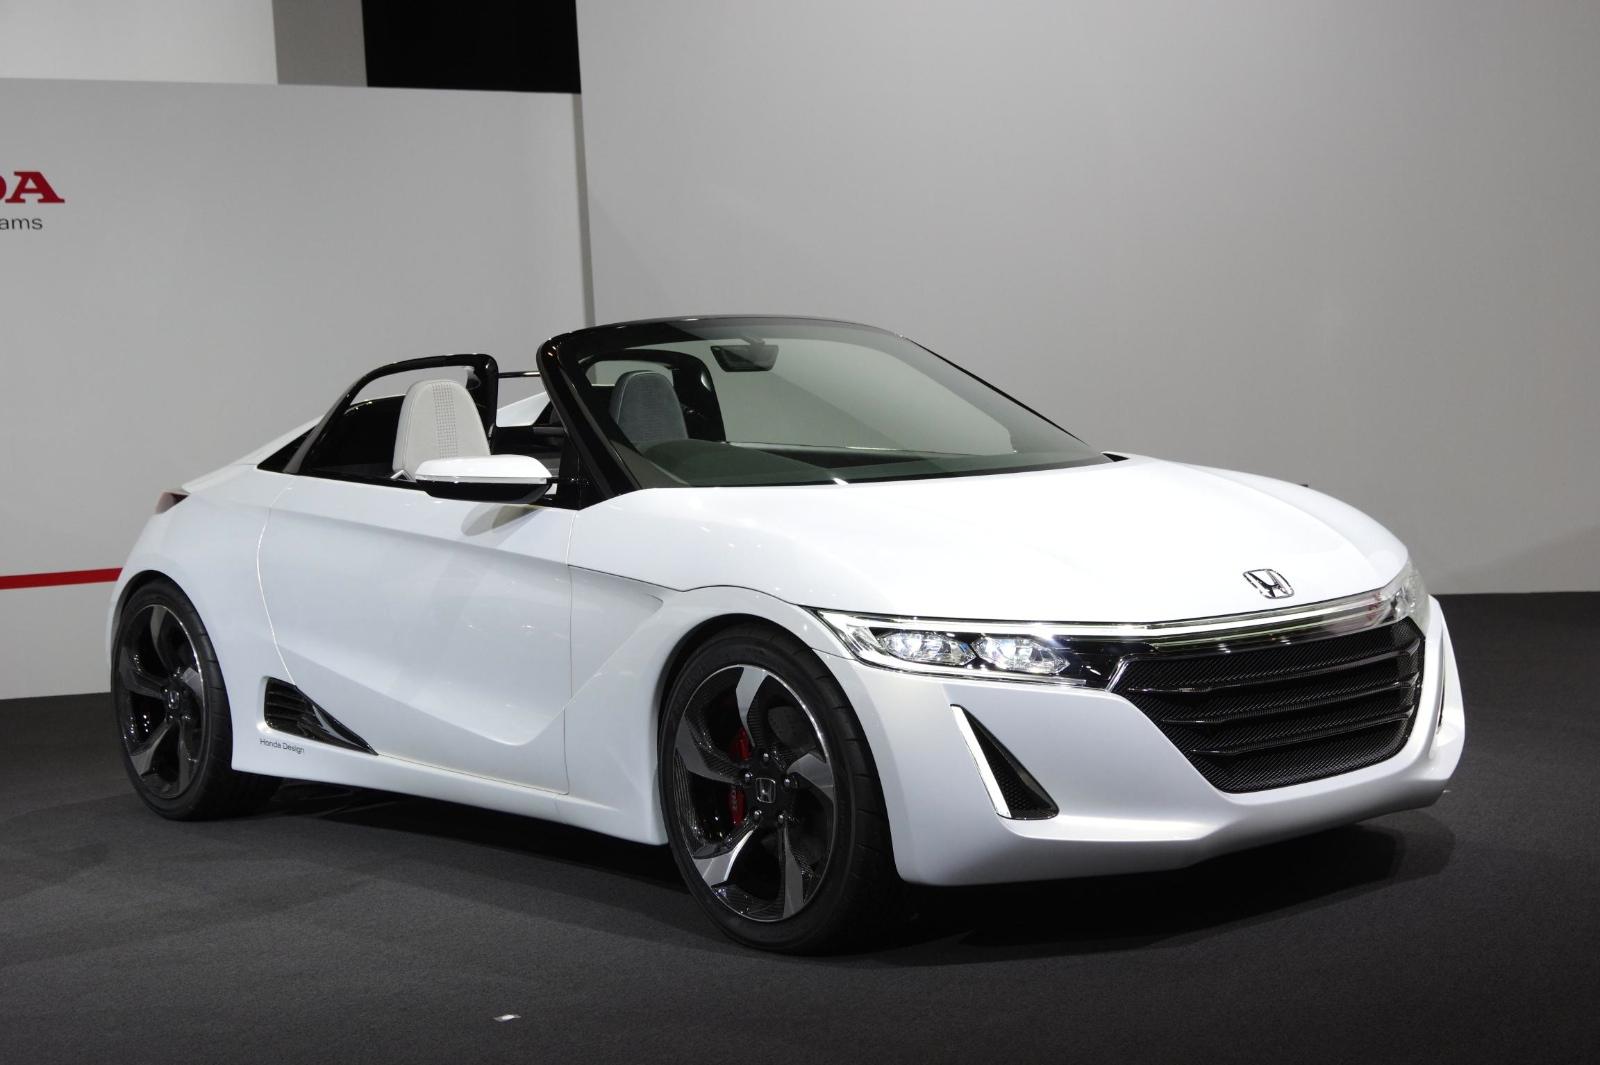 Shrunken NSX Honda S660 Kei Sportscar Coming In 2015